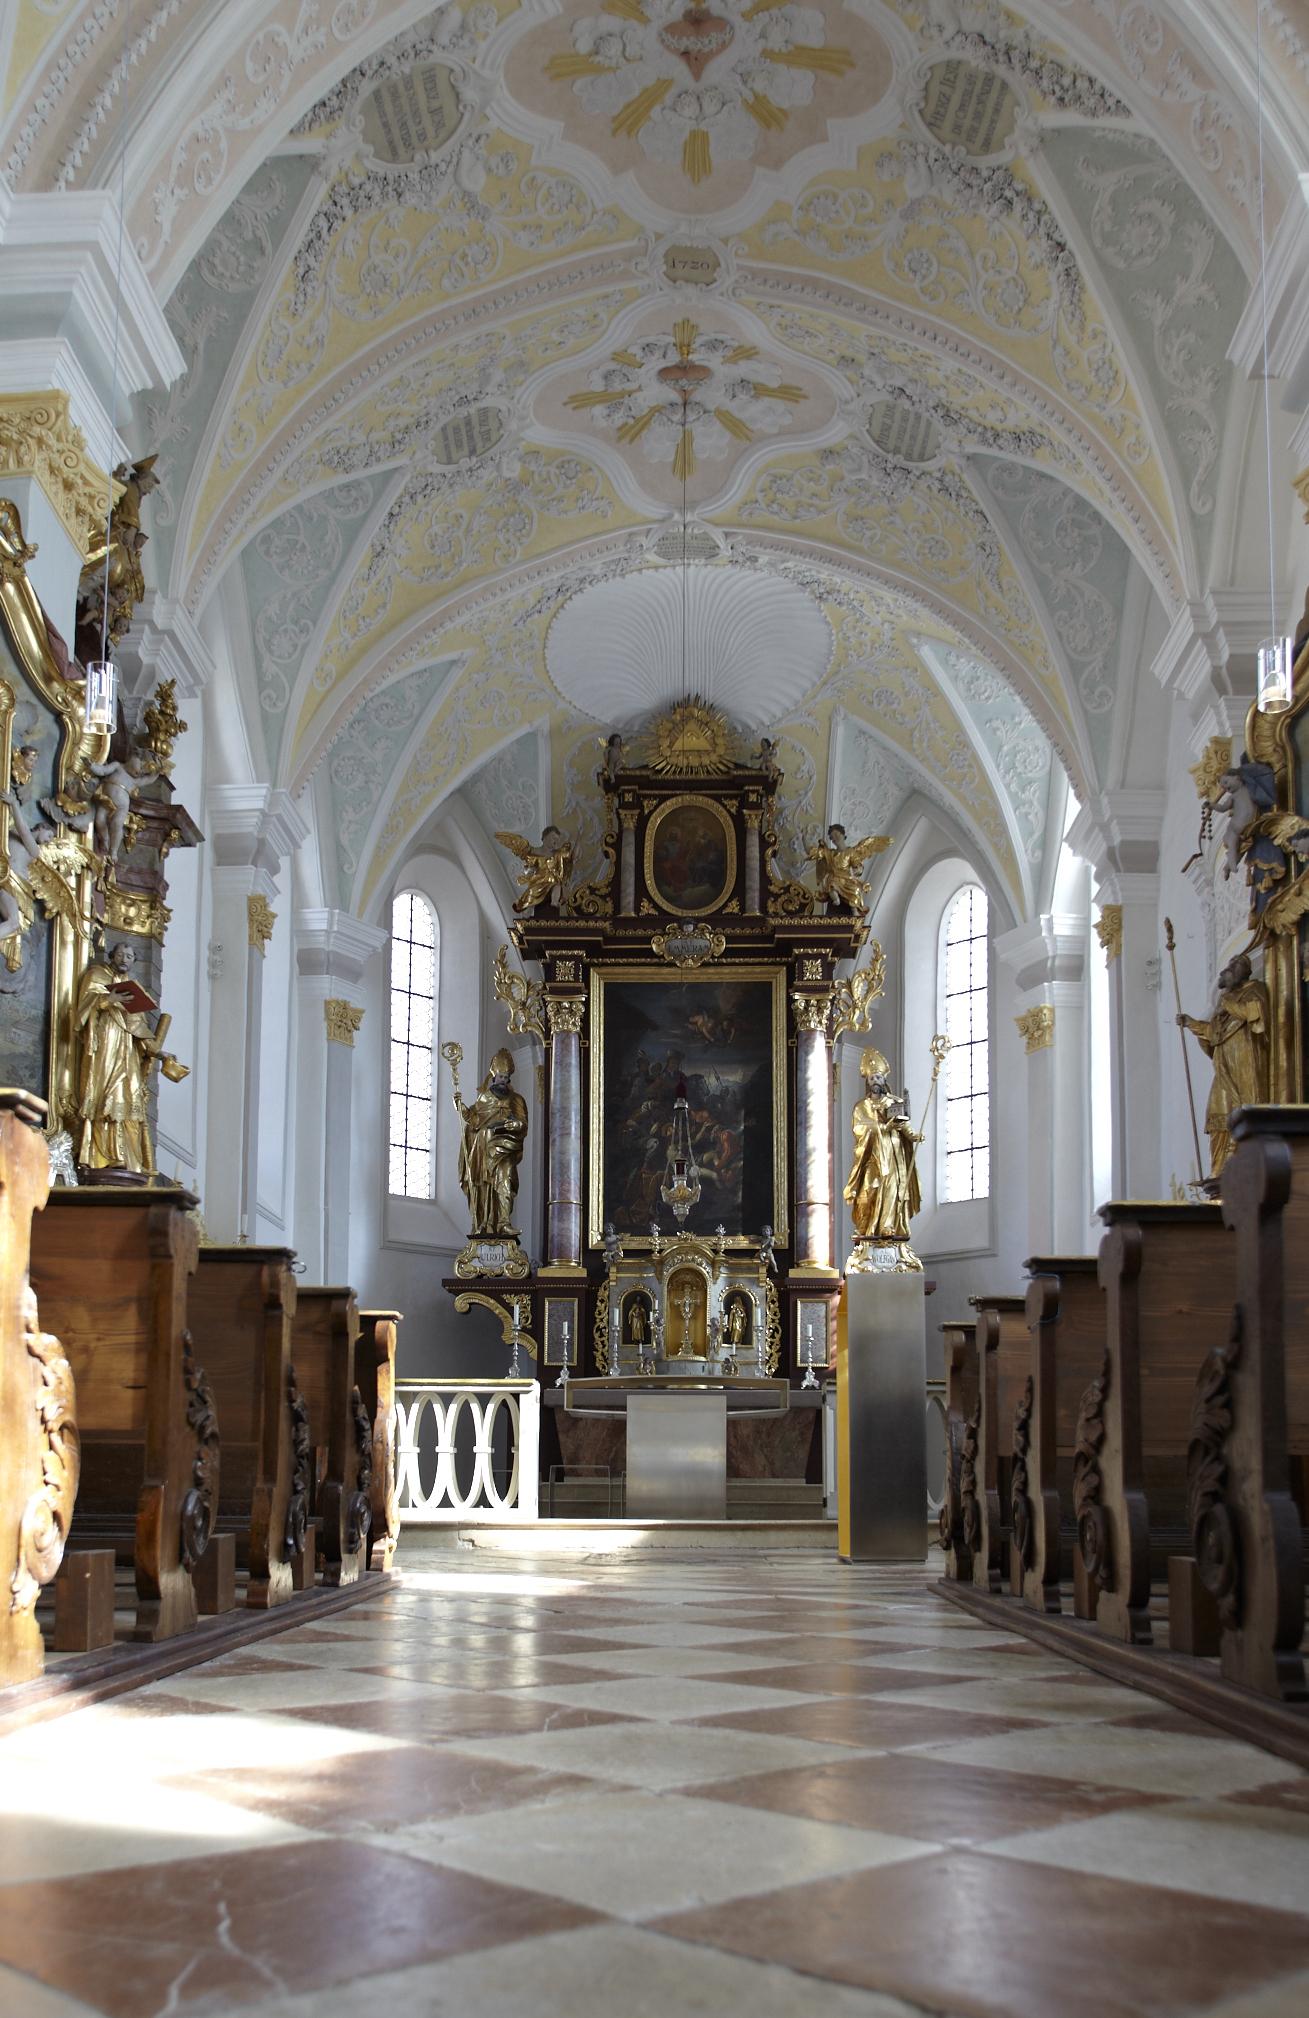 Pfarrkirche St. Emmeram Altar